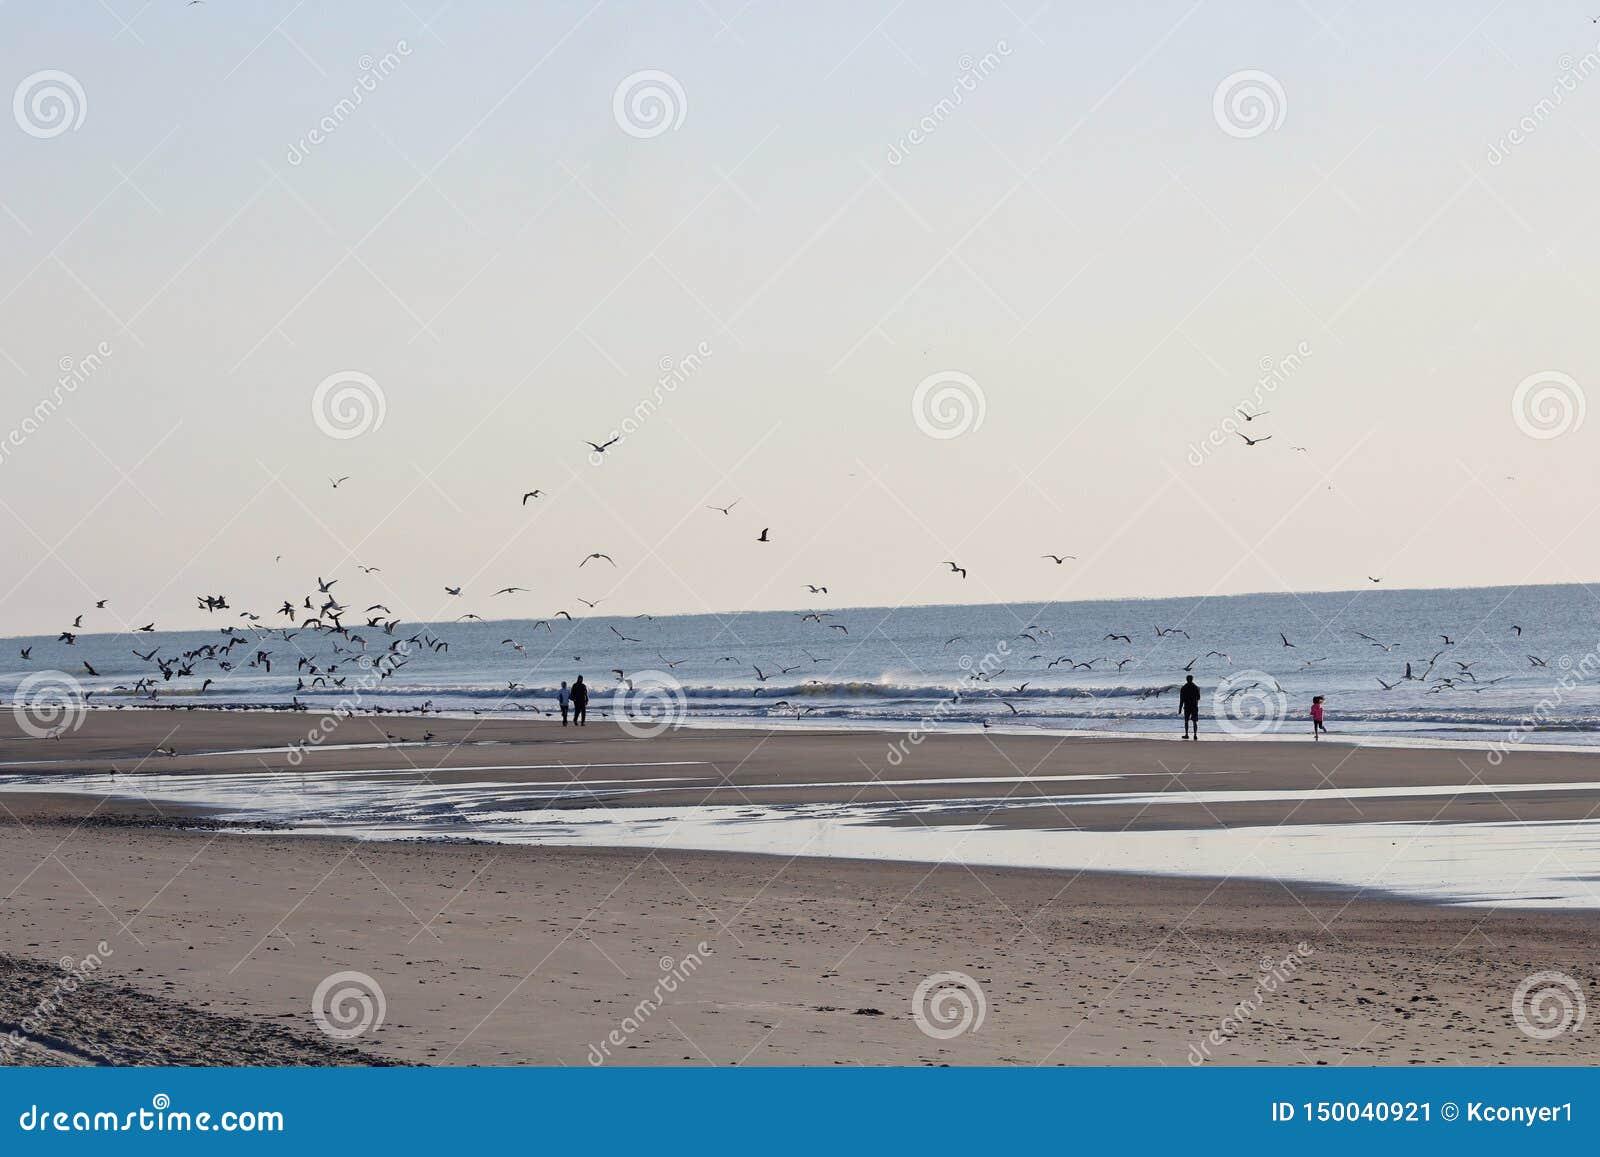 People and birds enjoying the beach